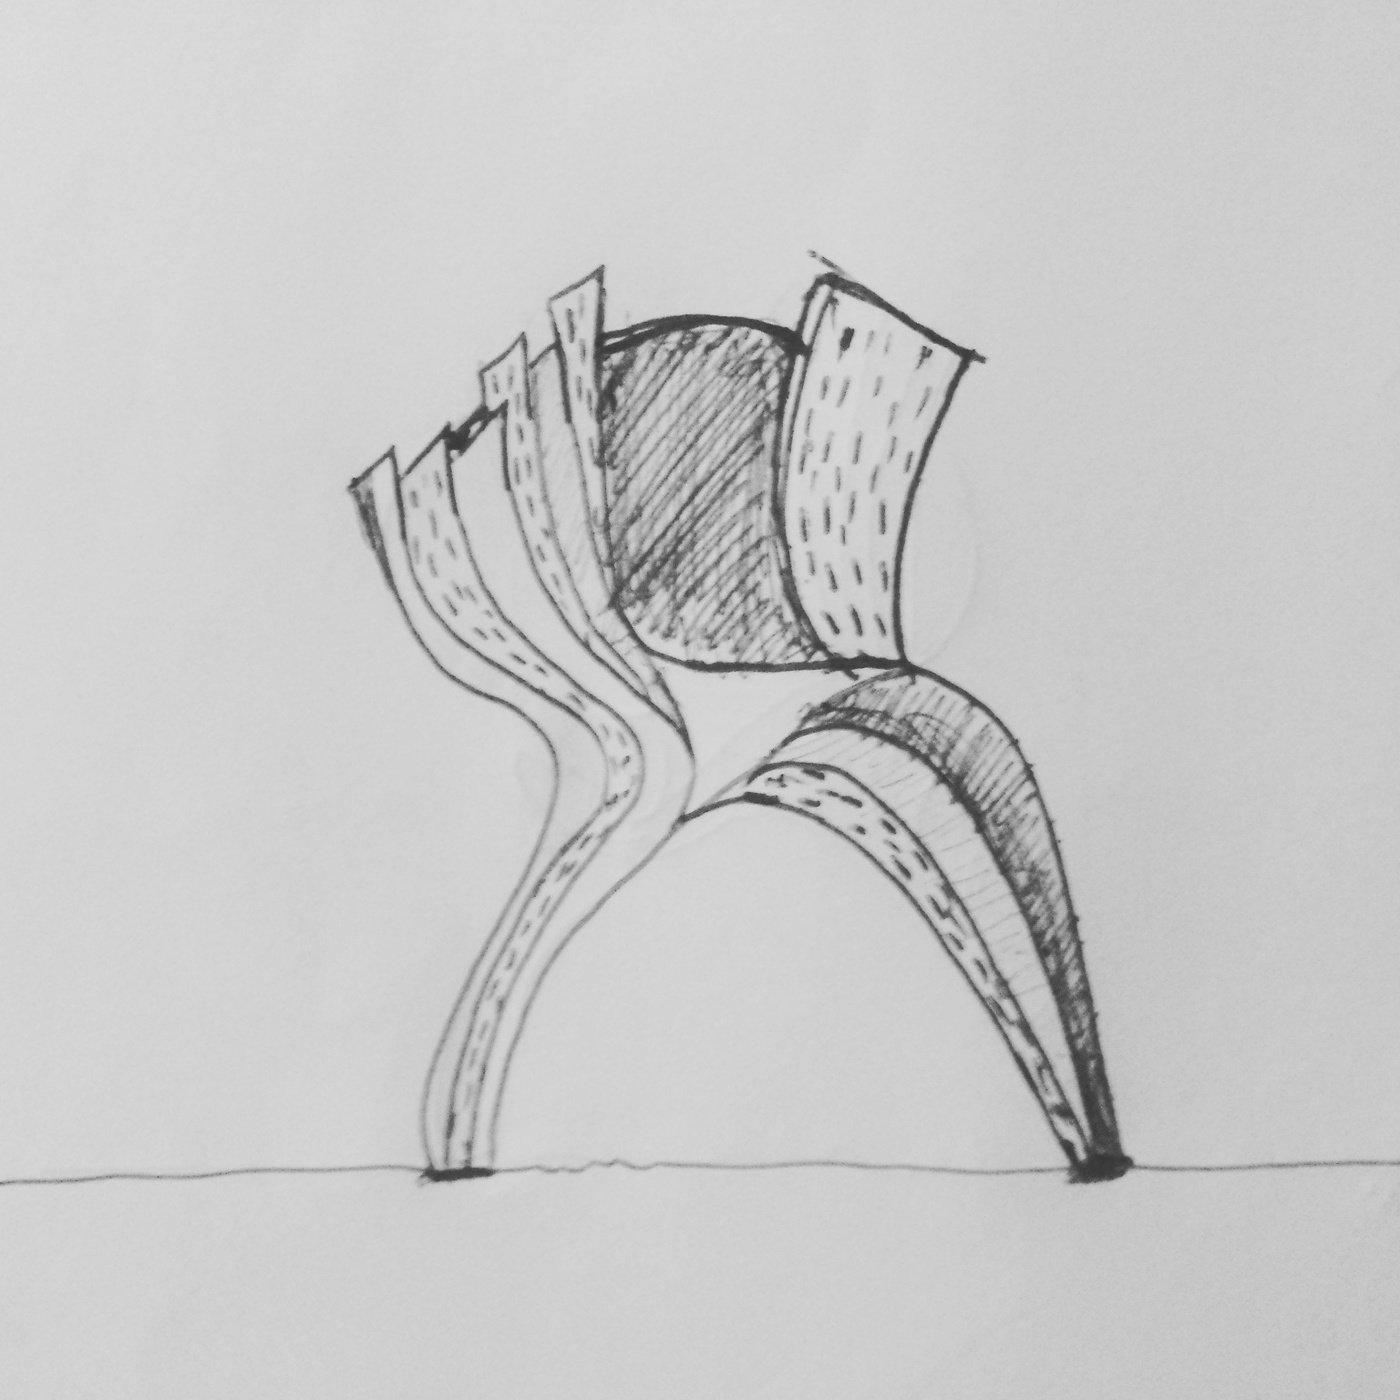 chair design drawing. Chair Design Drawing